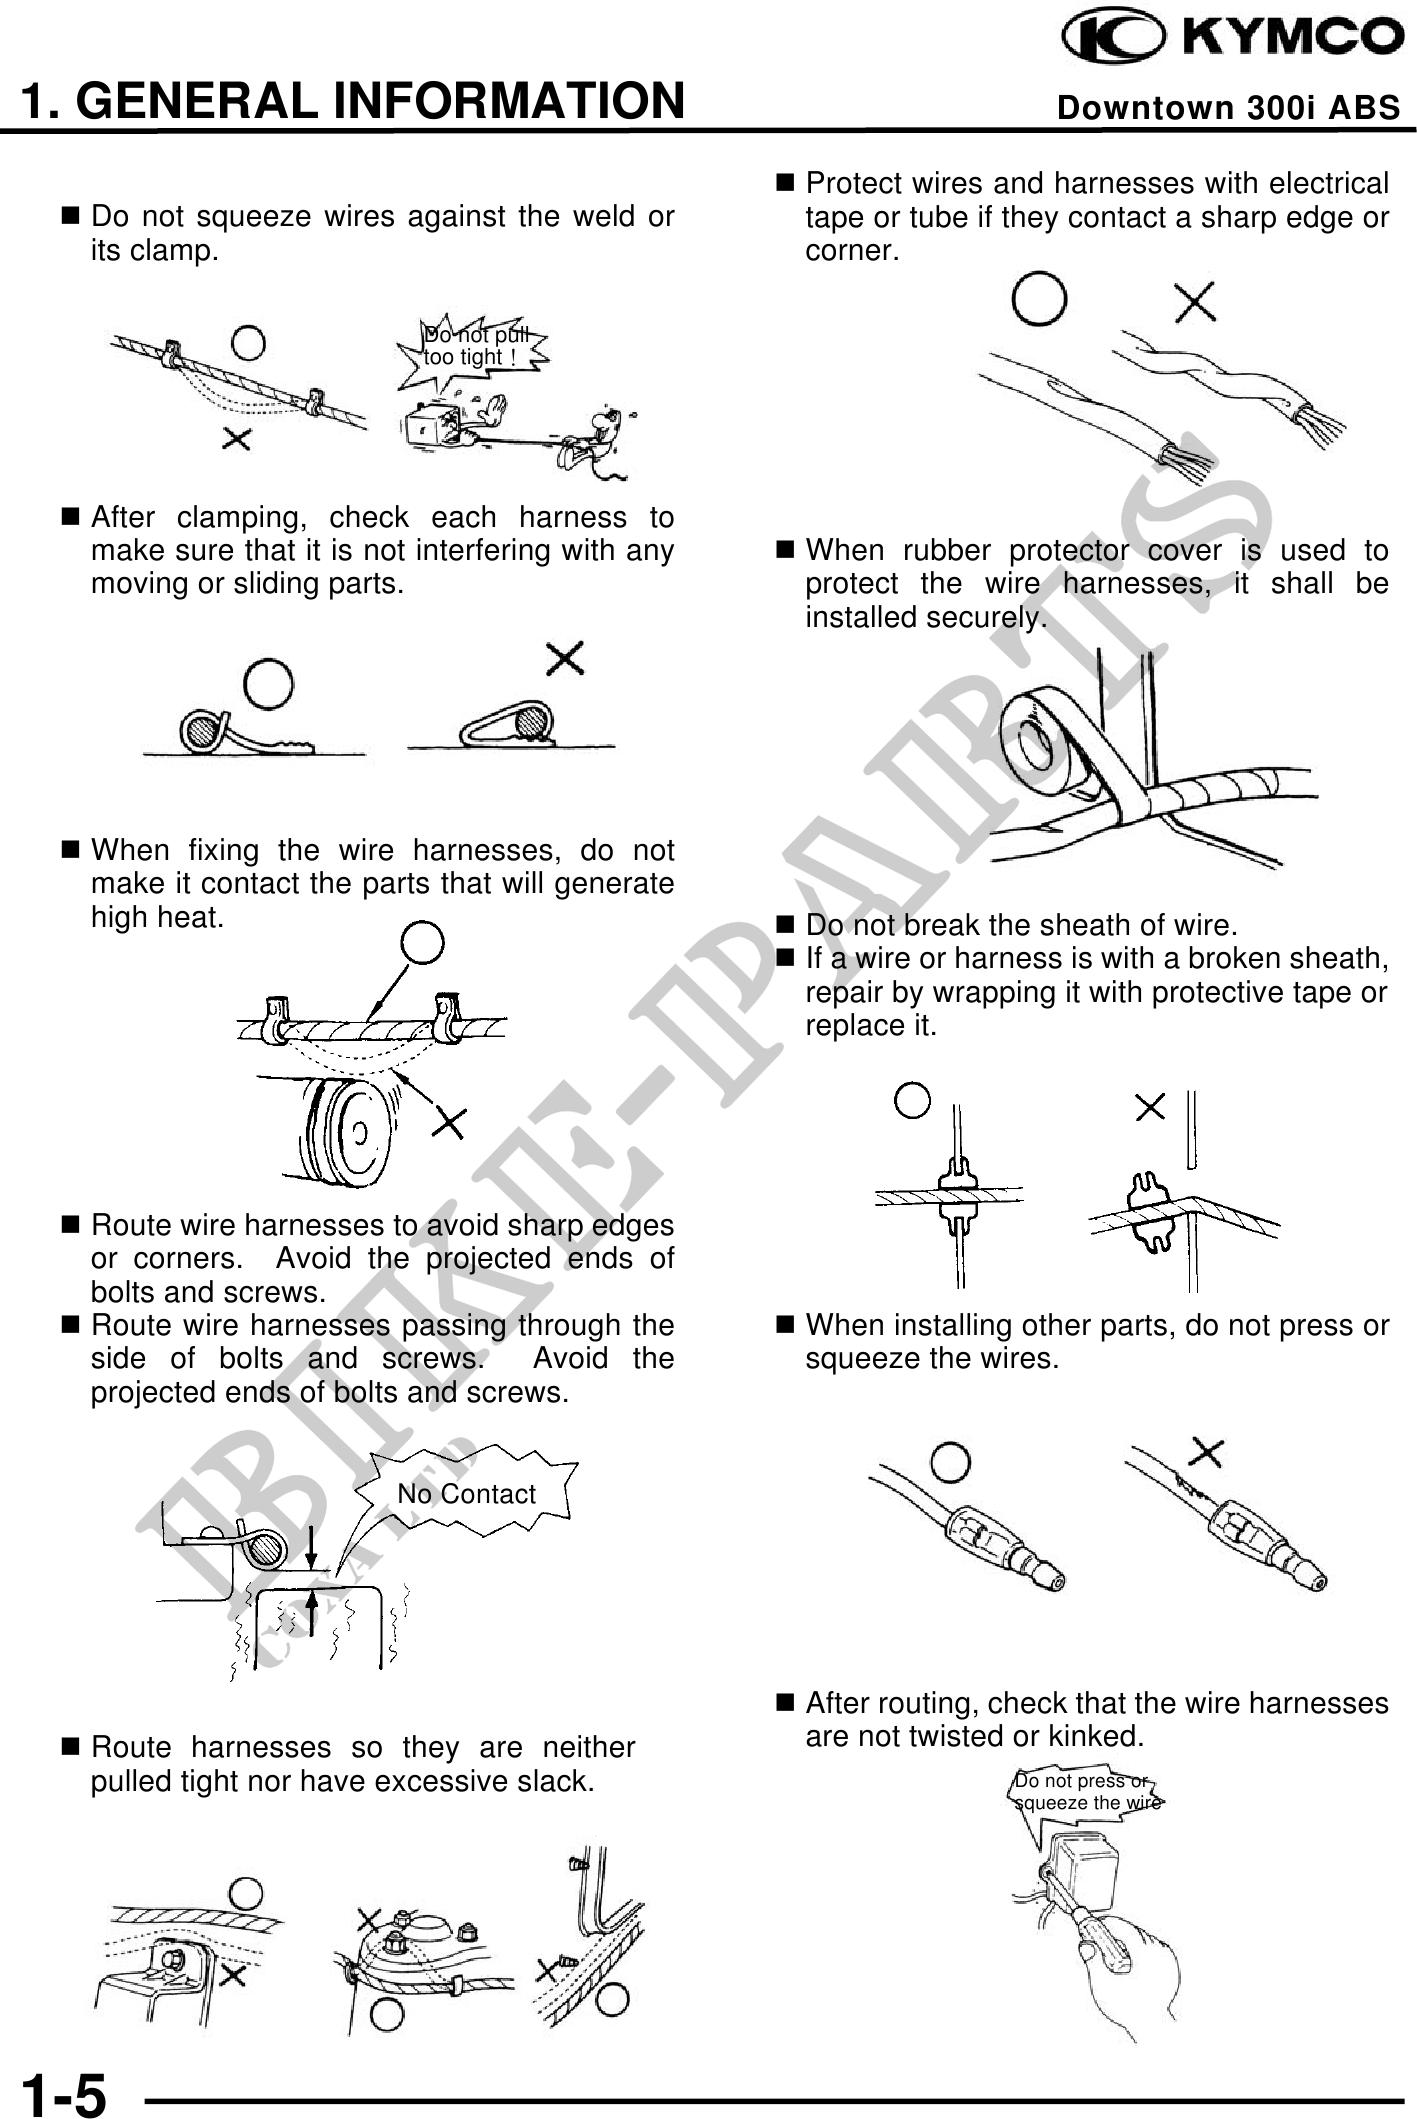 Kymco Catalogue De Pices Dtaches Dorigine Wiring Harness Dinkstreet 300 I Abs Manuel Atelier Page 8